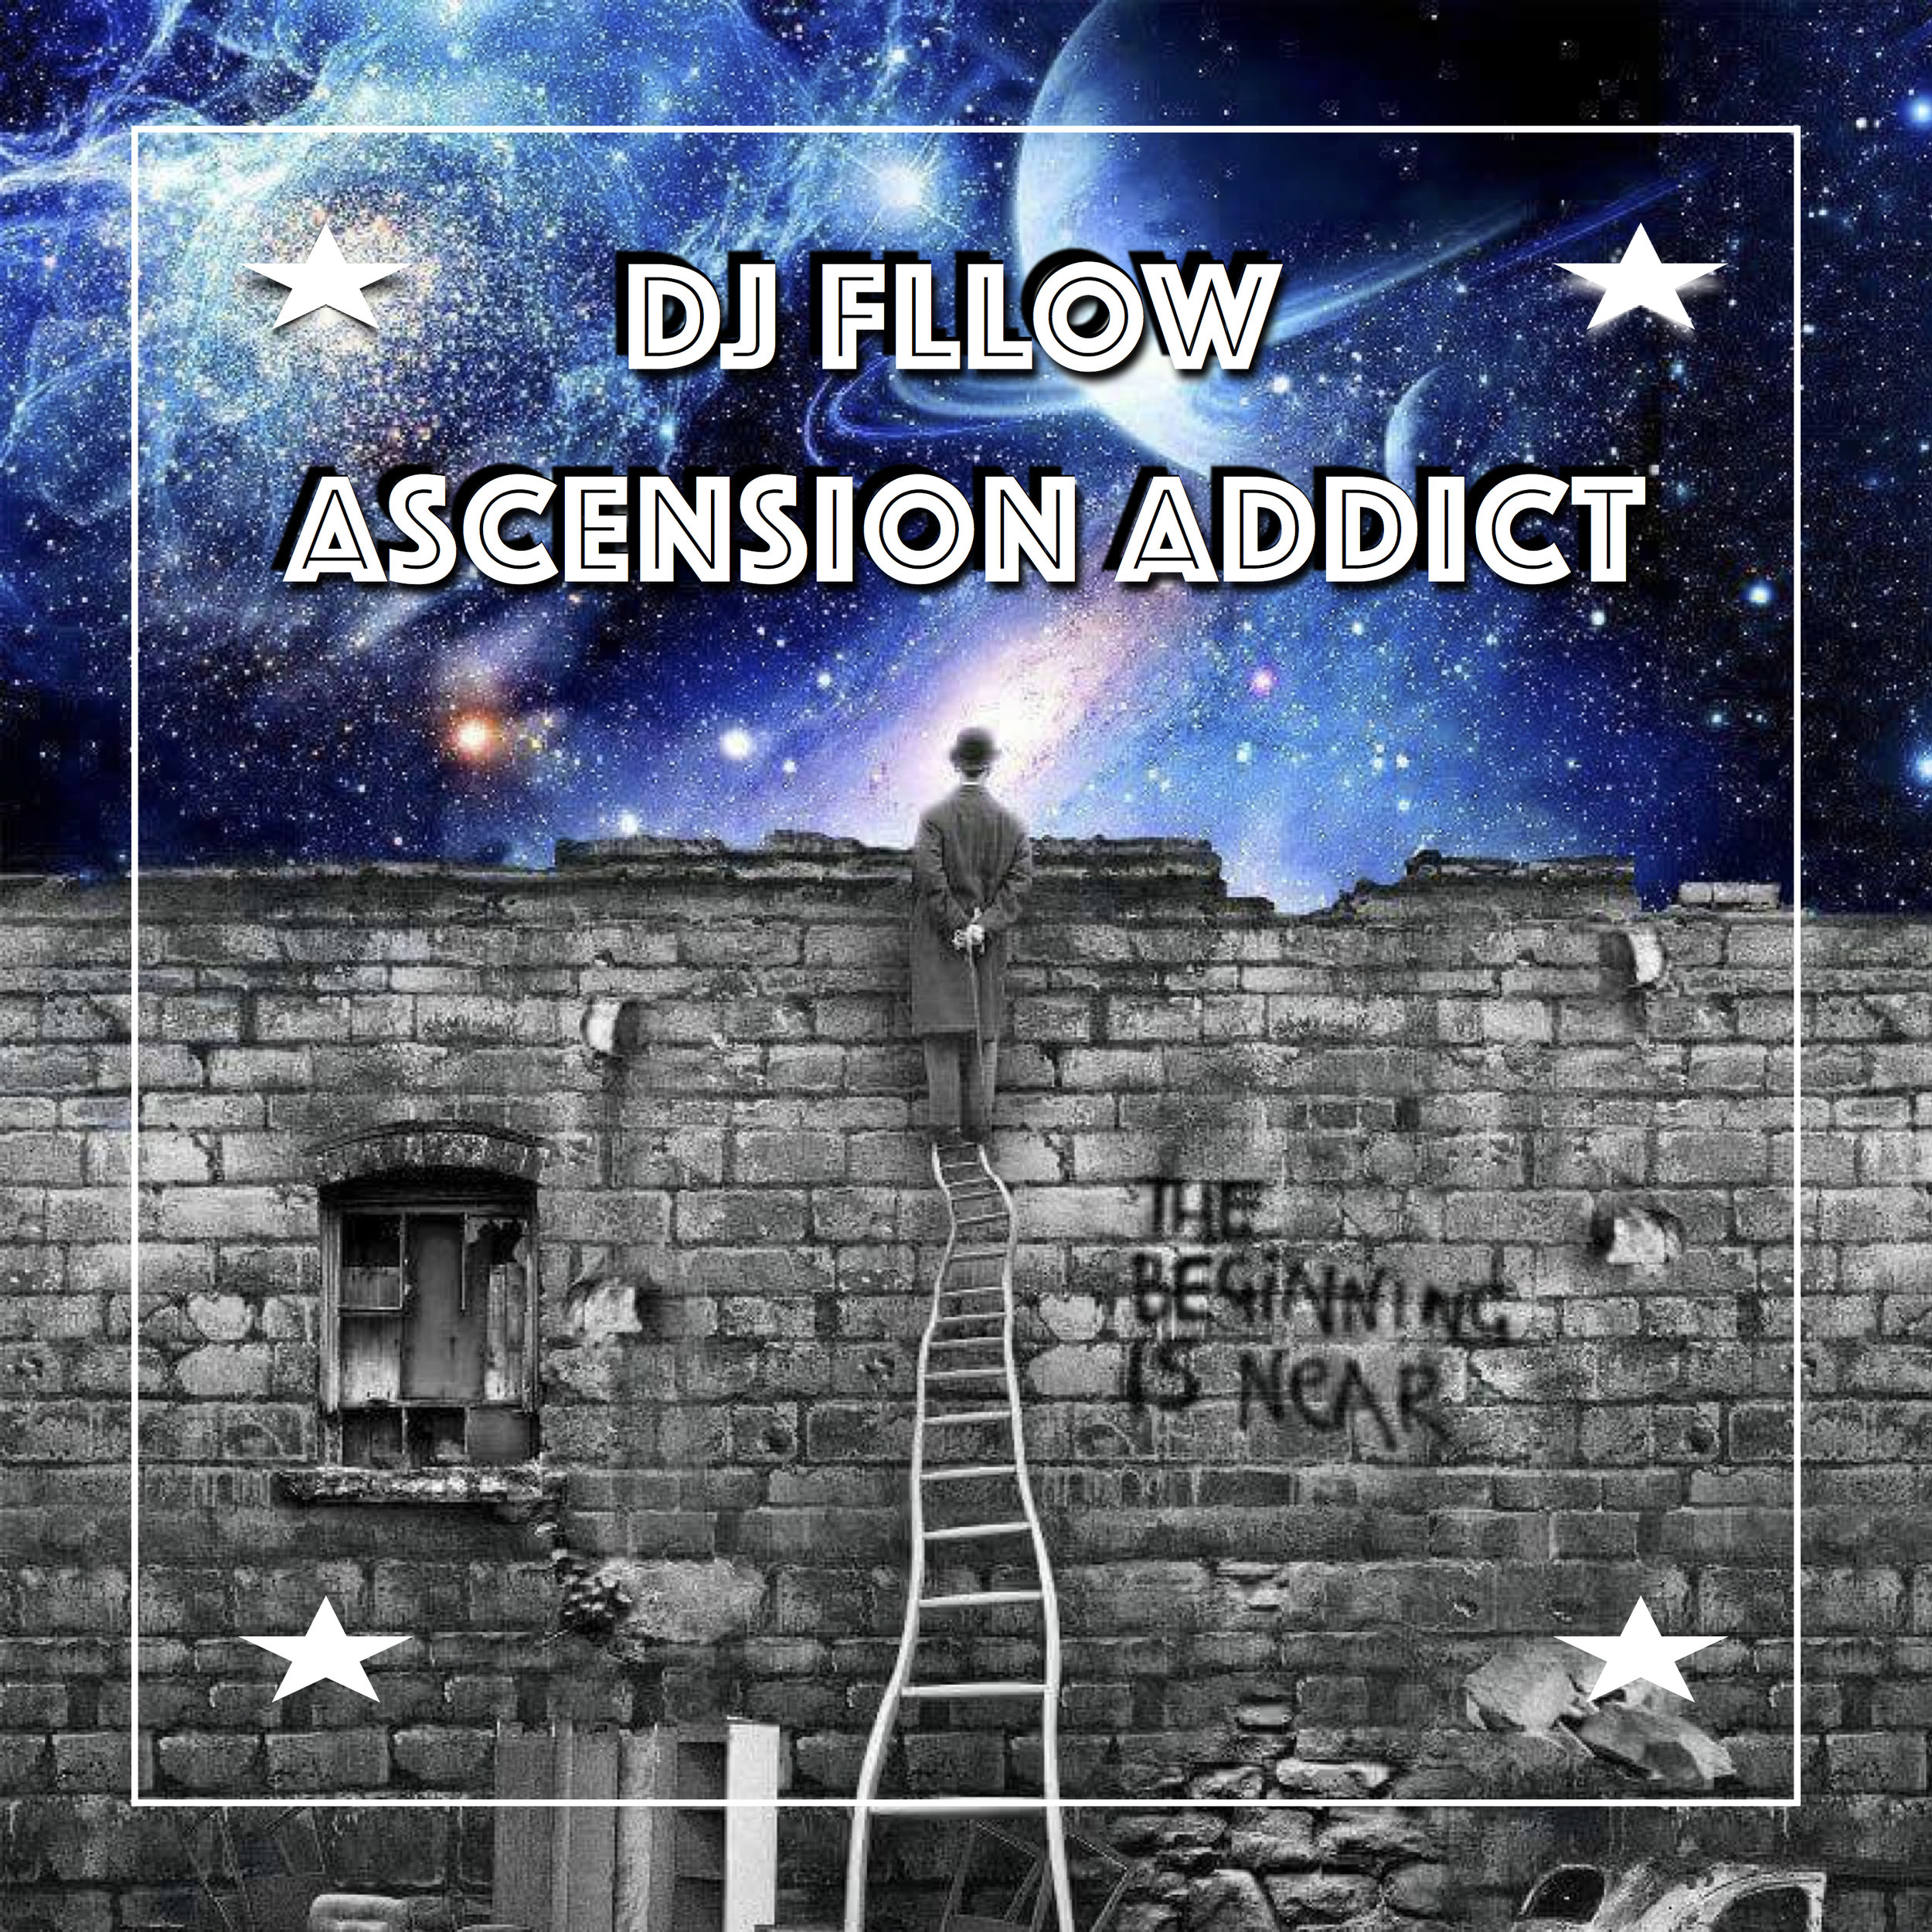 DJ FLLOW ASCENSION ADDICT BEGINNING NEAR ALBUM.jpg